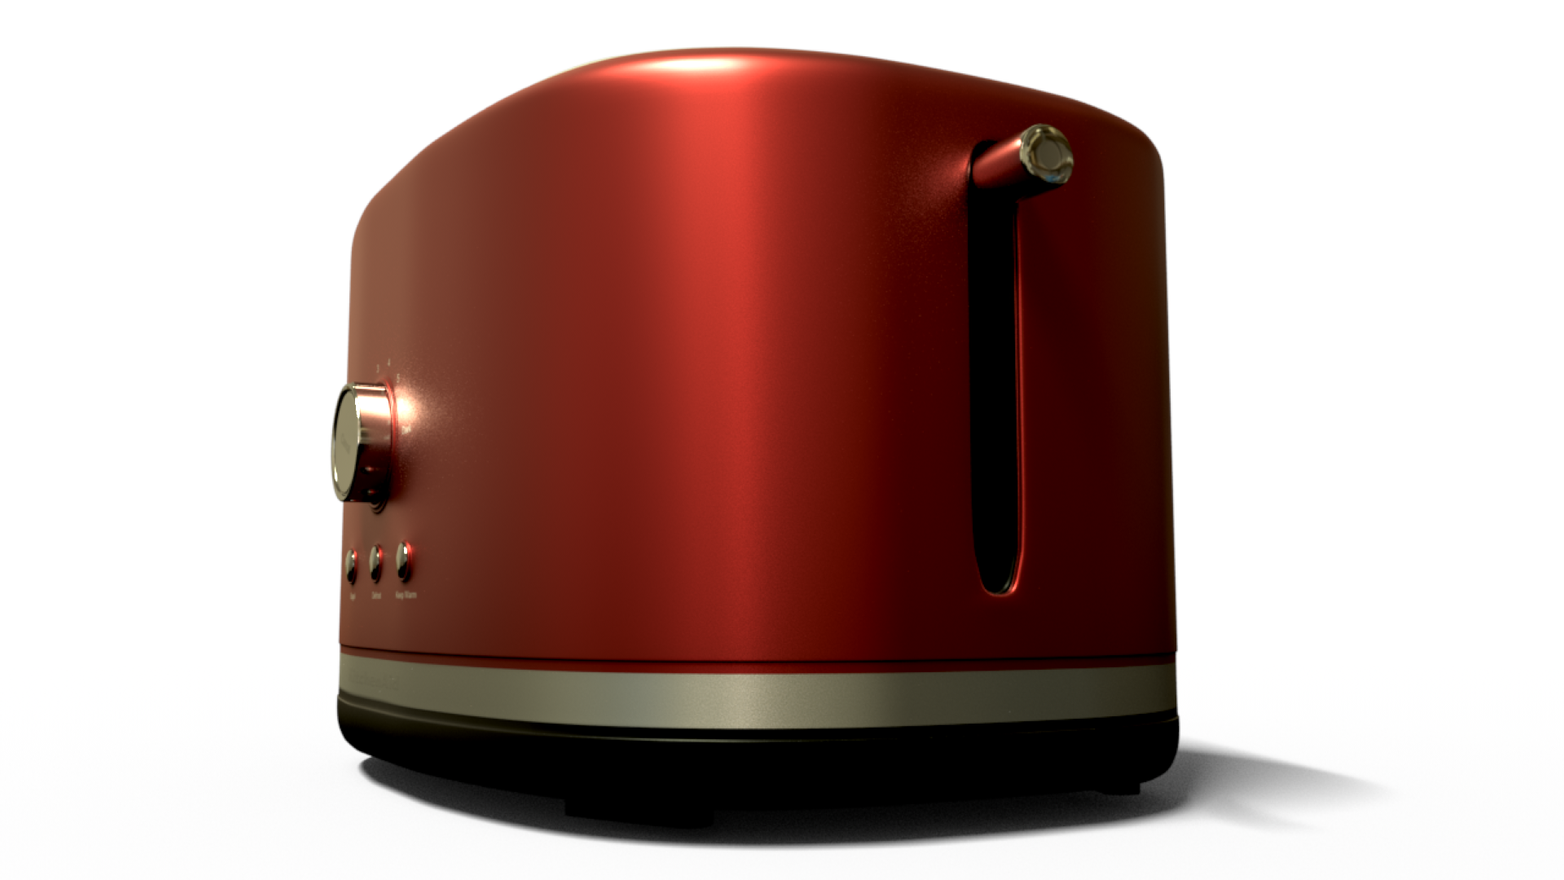 Toaster Render 2